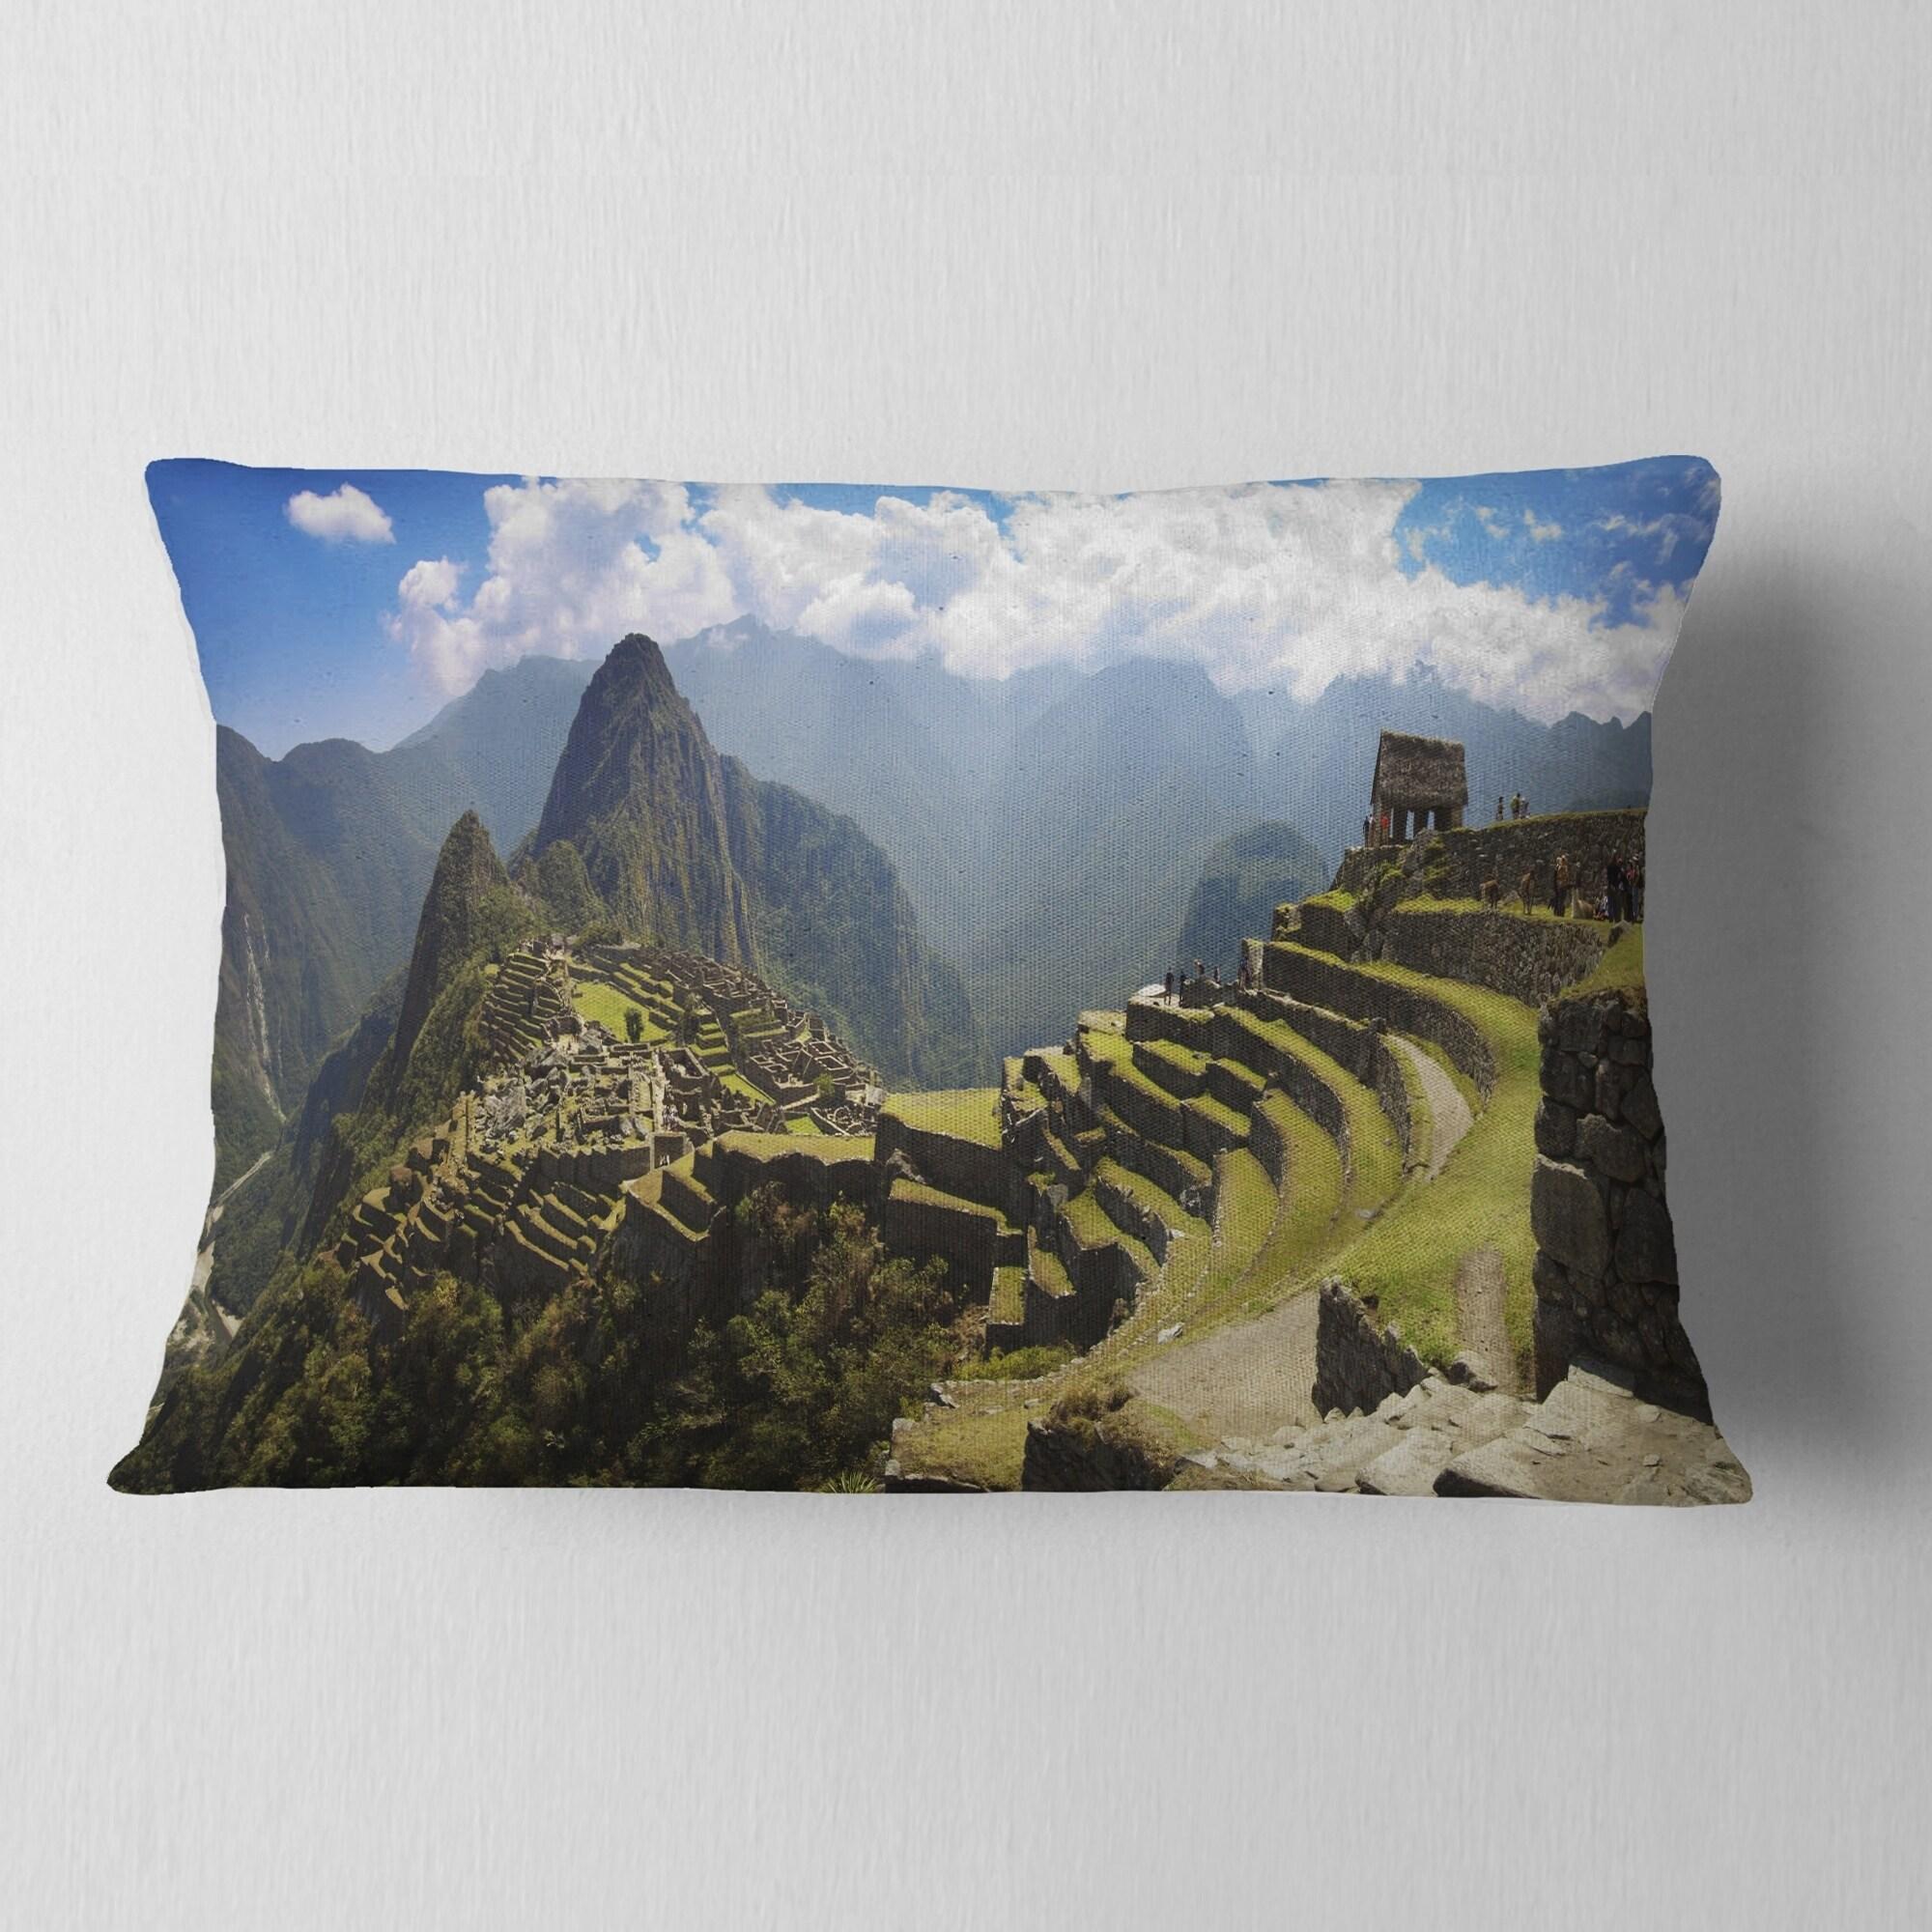 Designart Machu Picchu Panorama Landscape Photo Throw Pillow On Sale Overstock 20890125